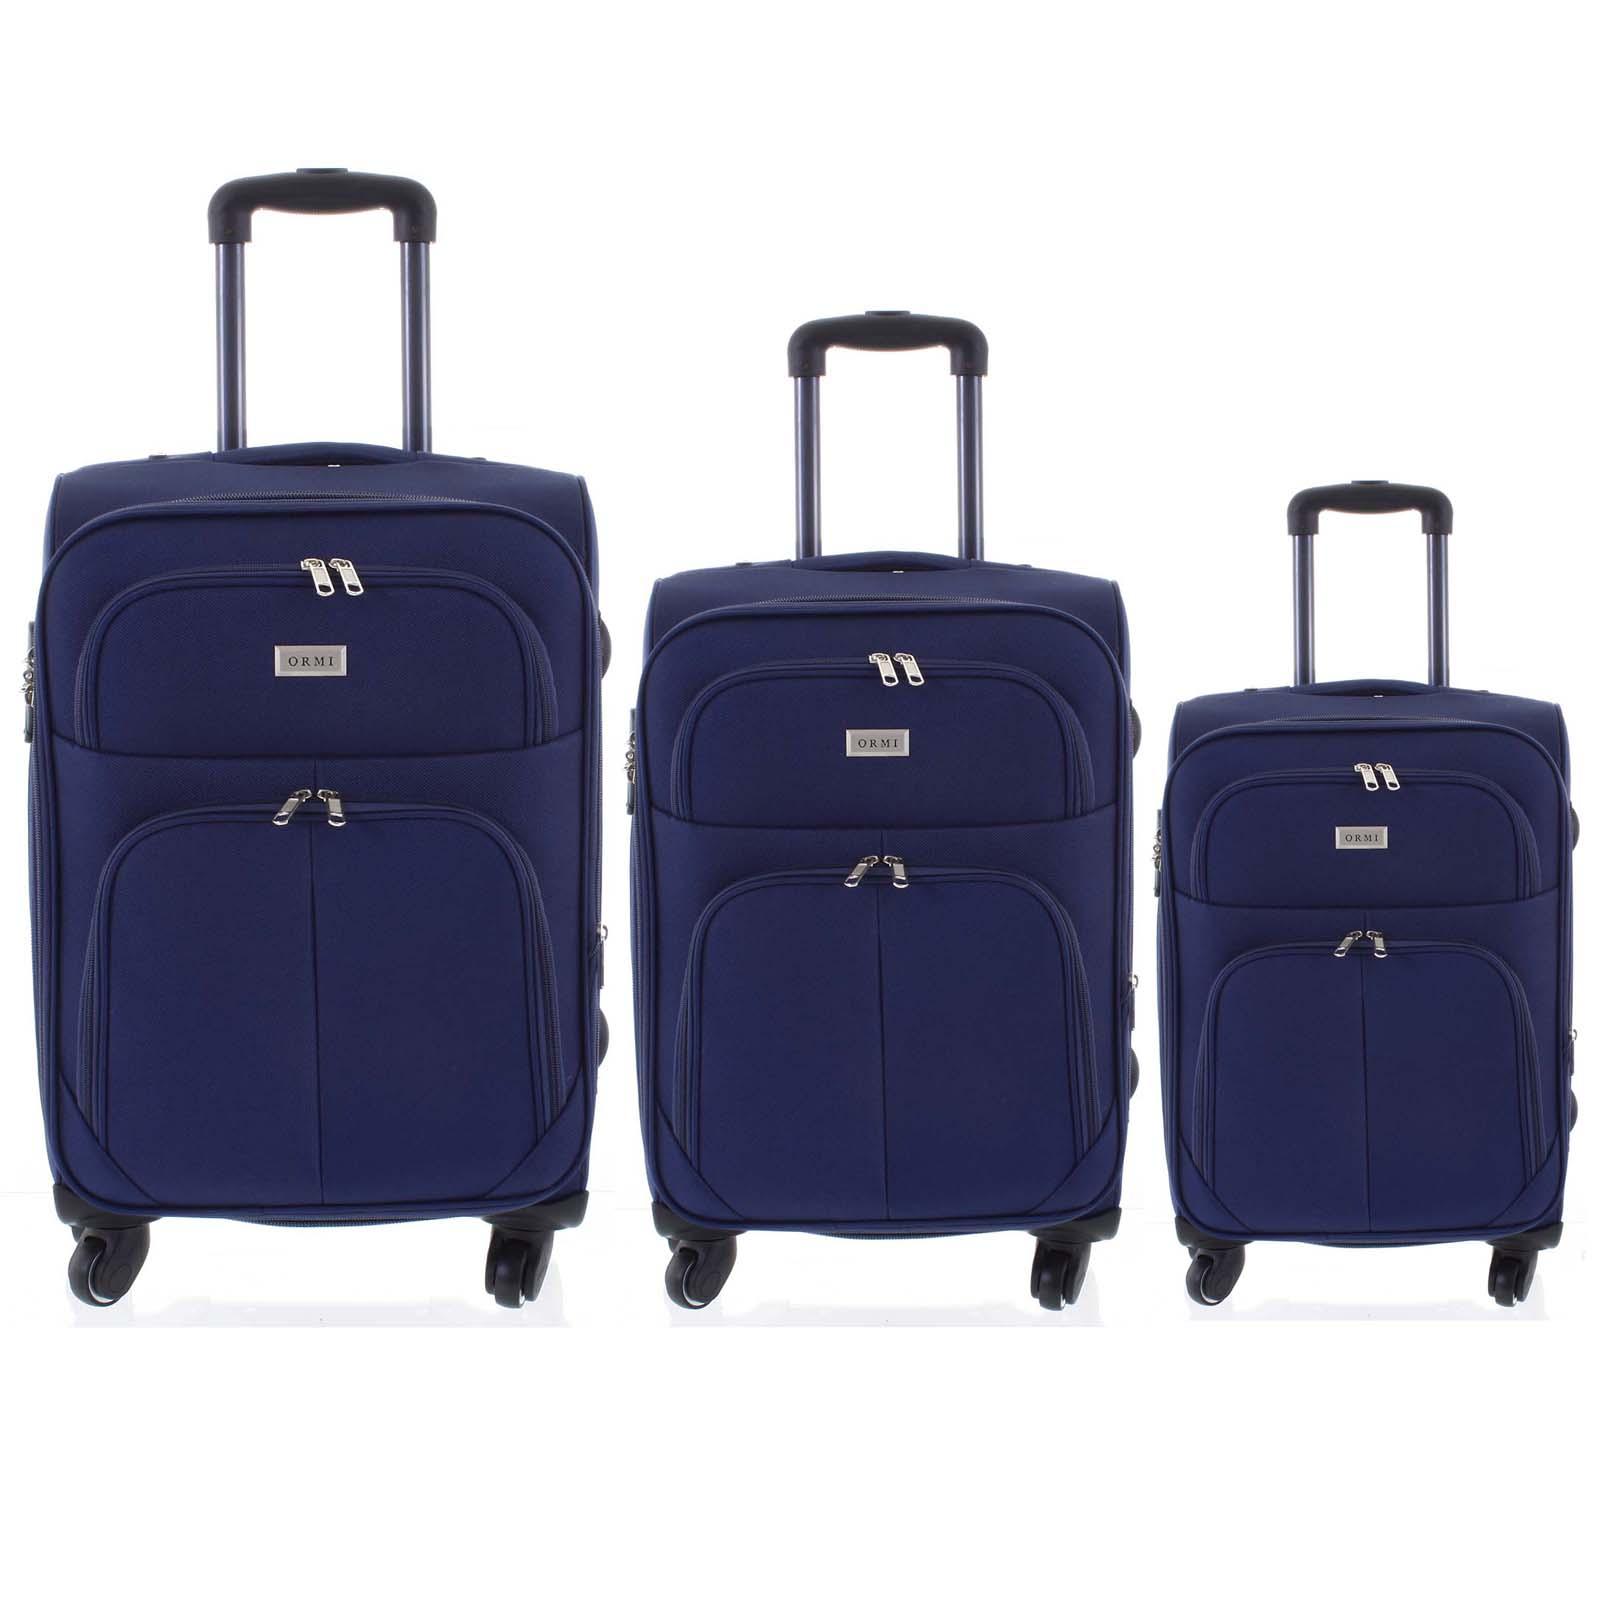 Cestovný kufor modrý sada - Ormi Tessa S, M, L modrá